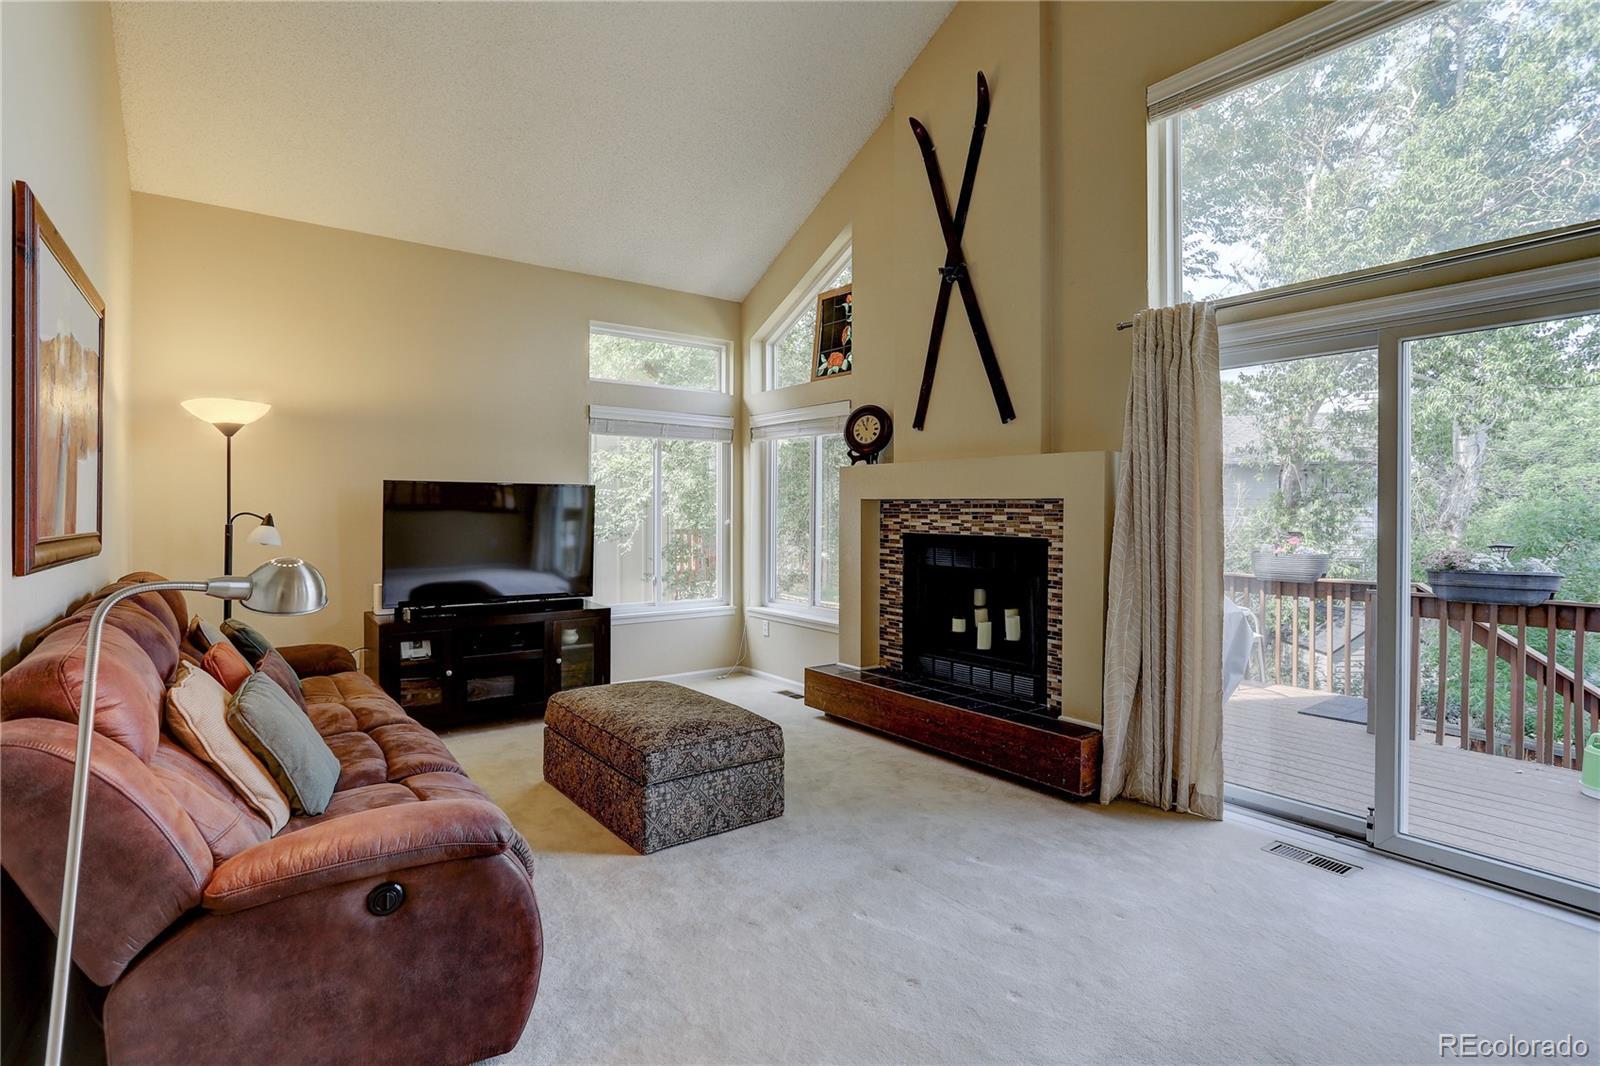 MLS# 9389187 - 5 - 1245 Goldsmith Drive, Highlands Ranch, CO 80126